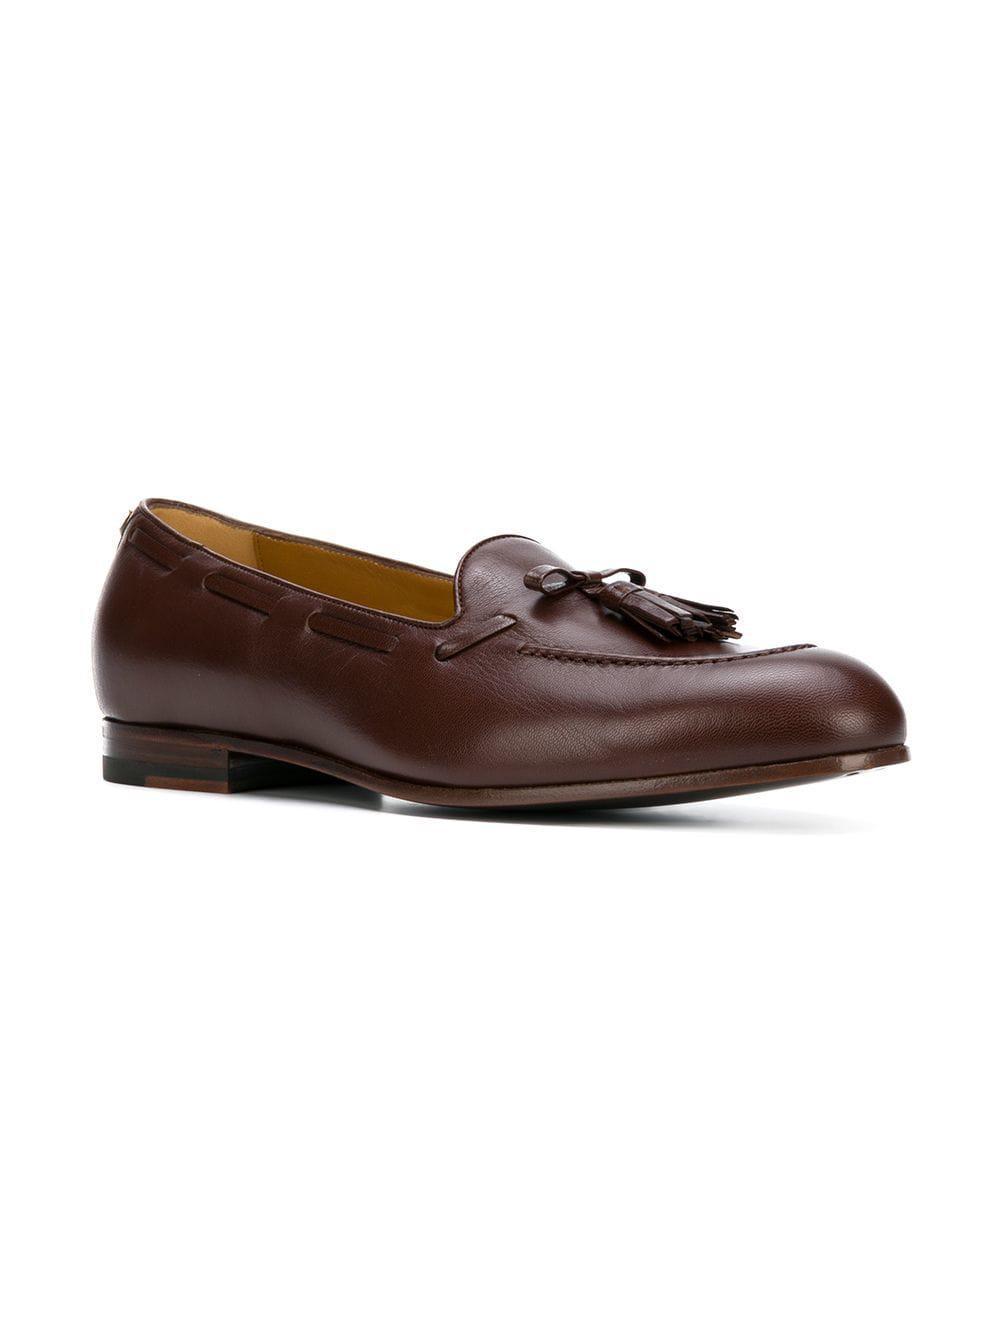 bdde3835509 Lyst - Gucci Tassel Loafers in Brown for Men